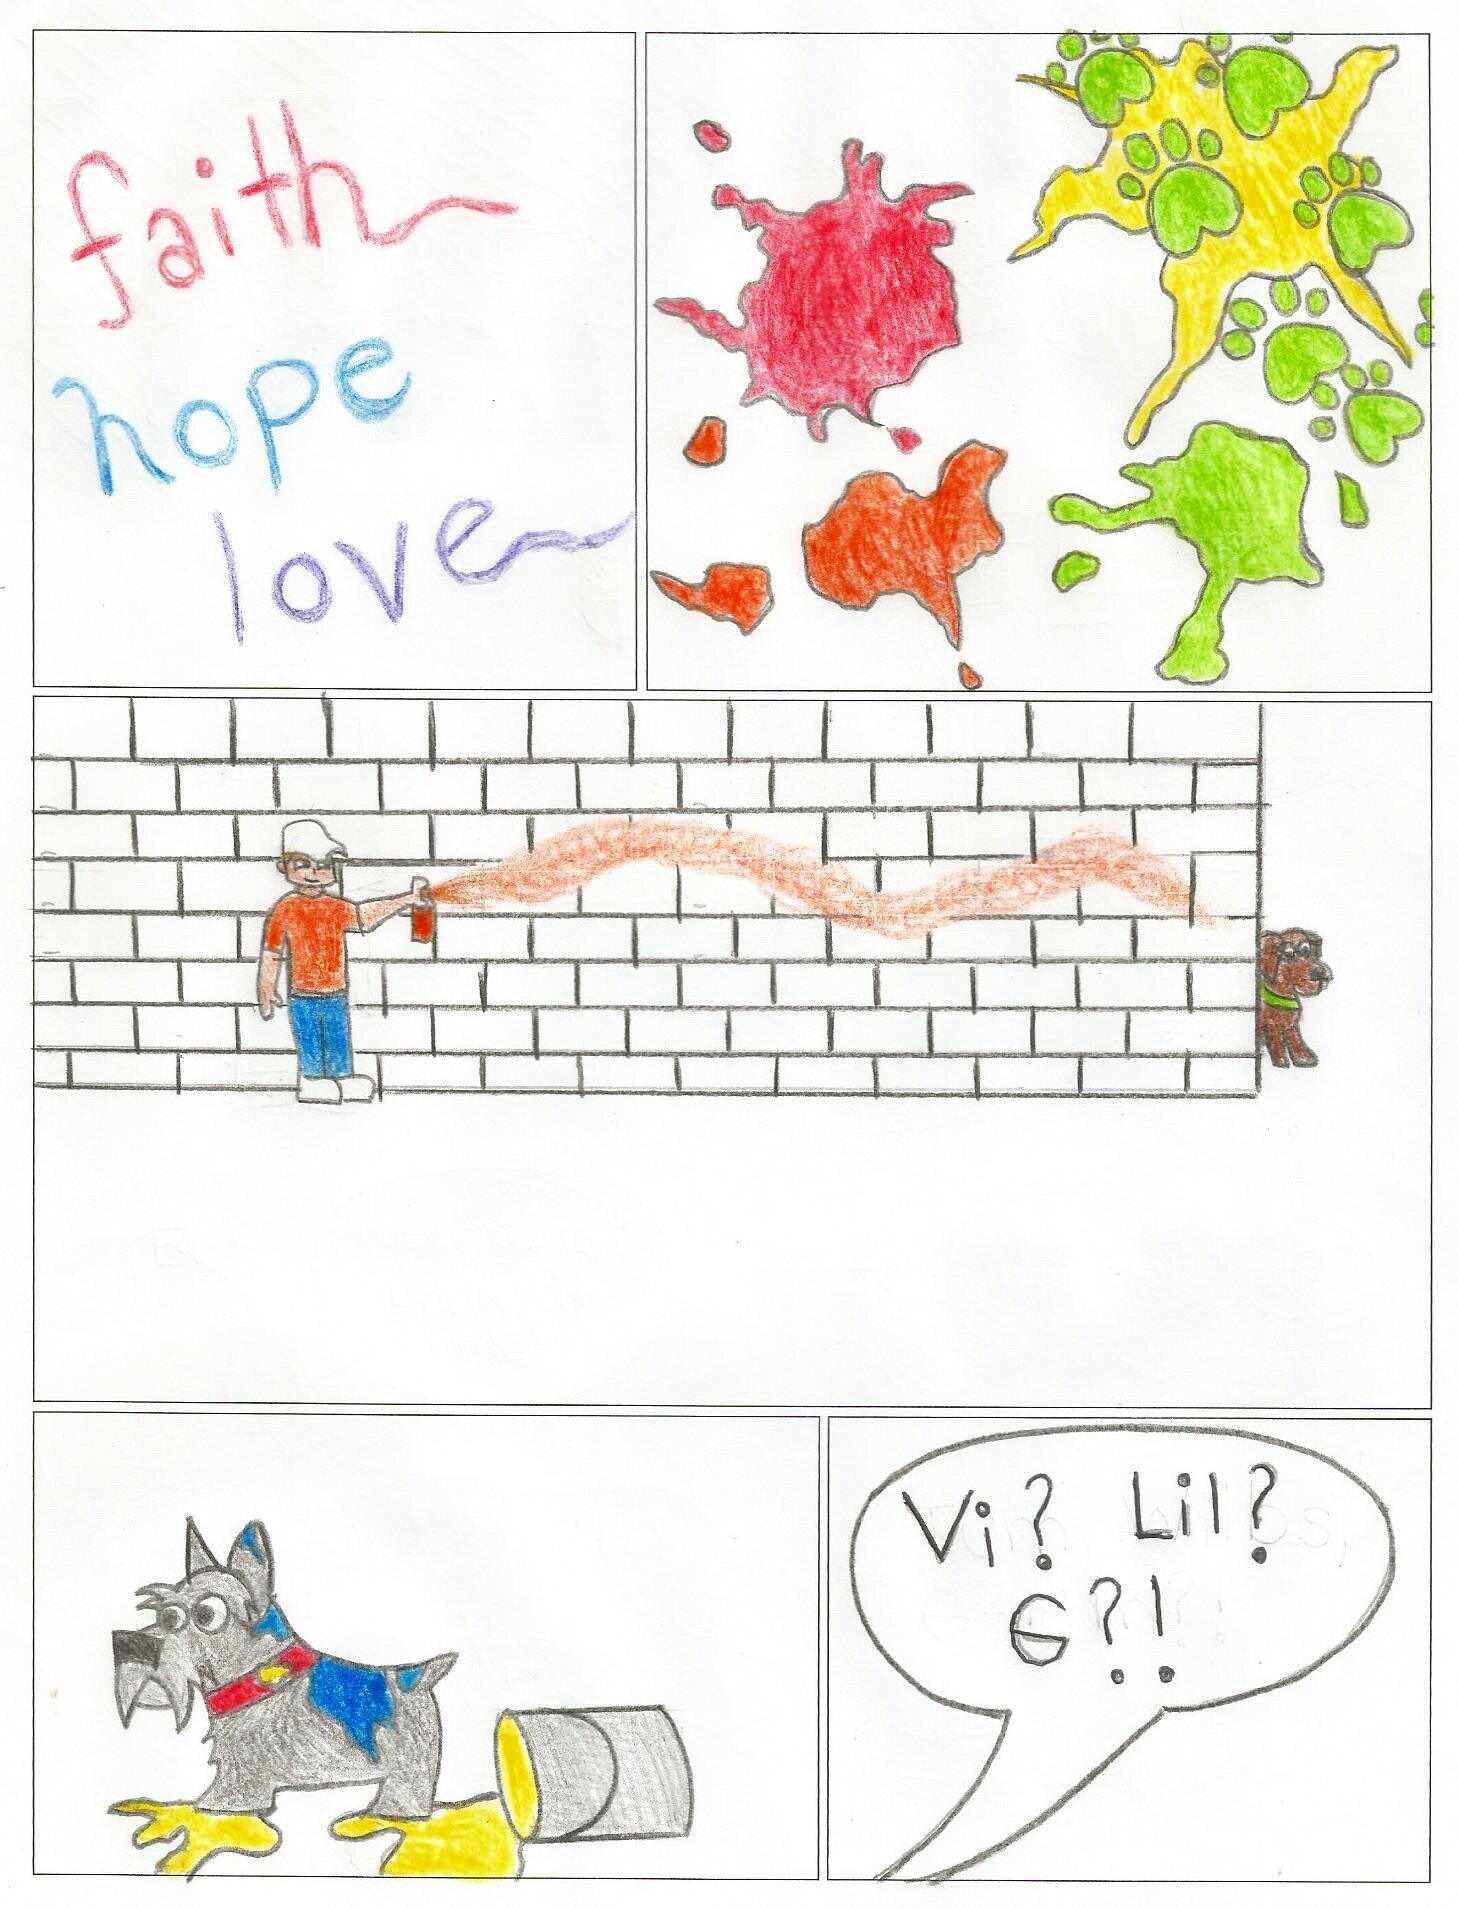 Comic+Strip+1-+page+3.jpg